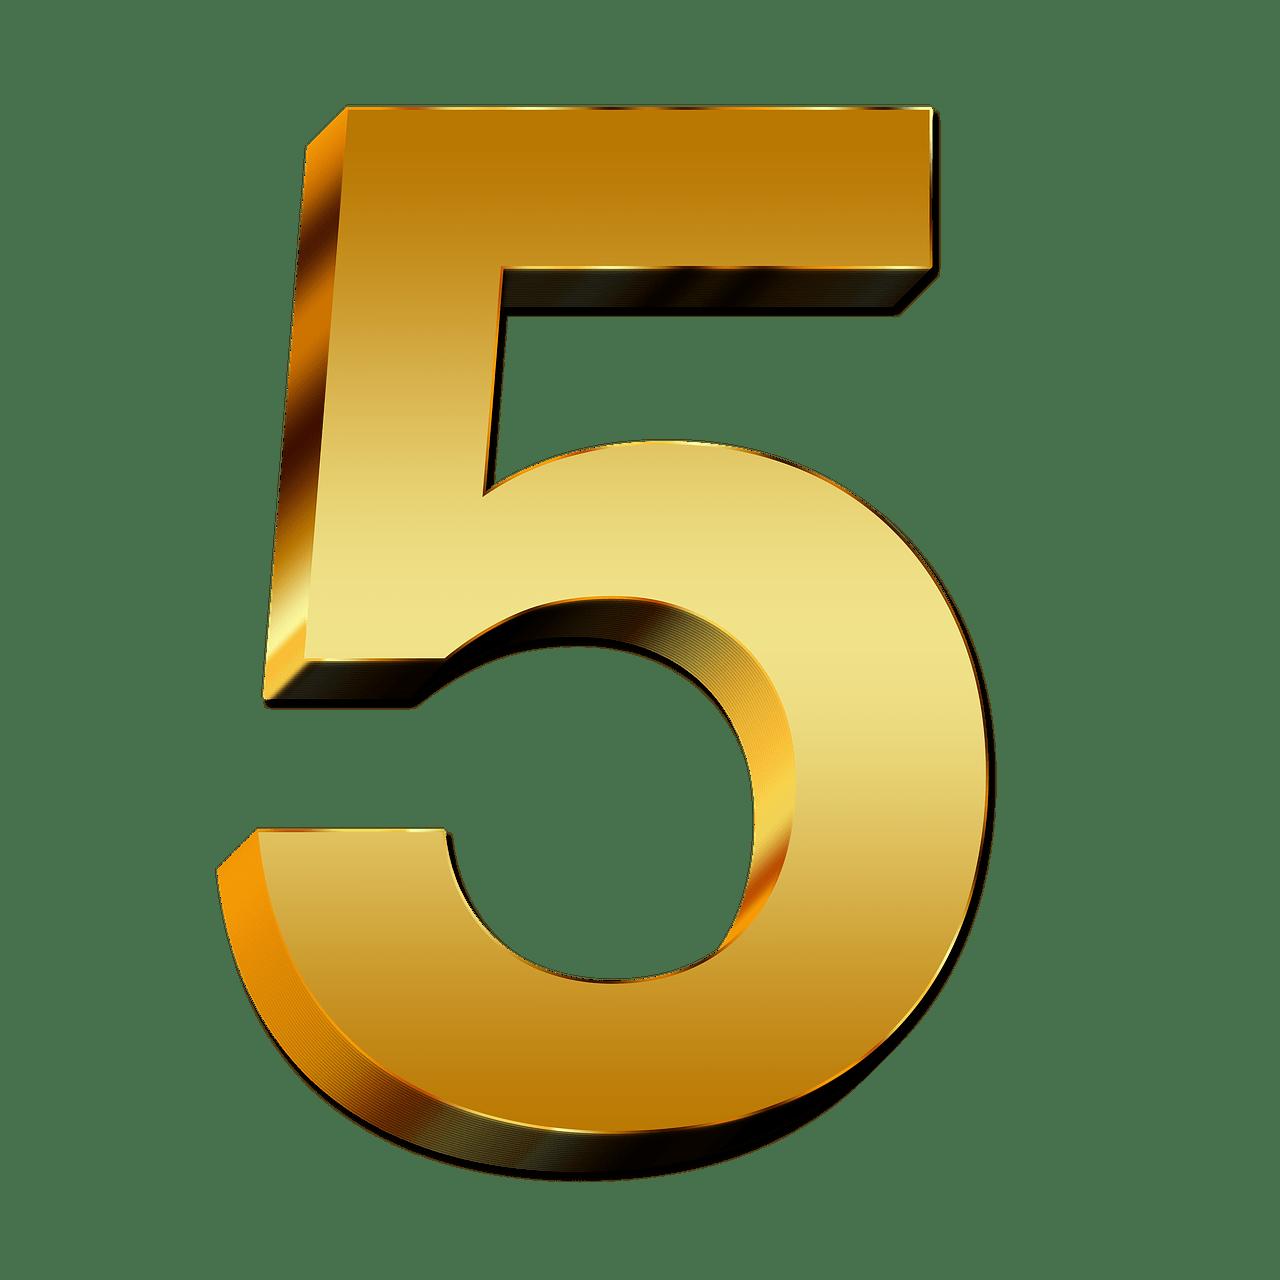 clip 6 clipart gold number. Transparent png stickpng